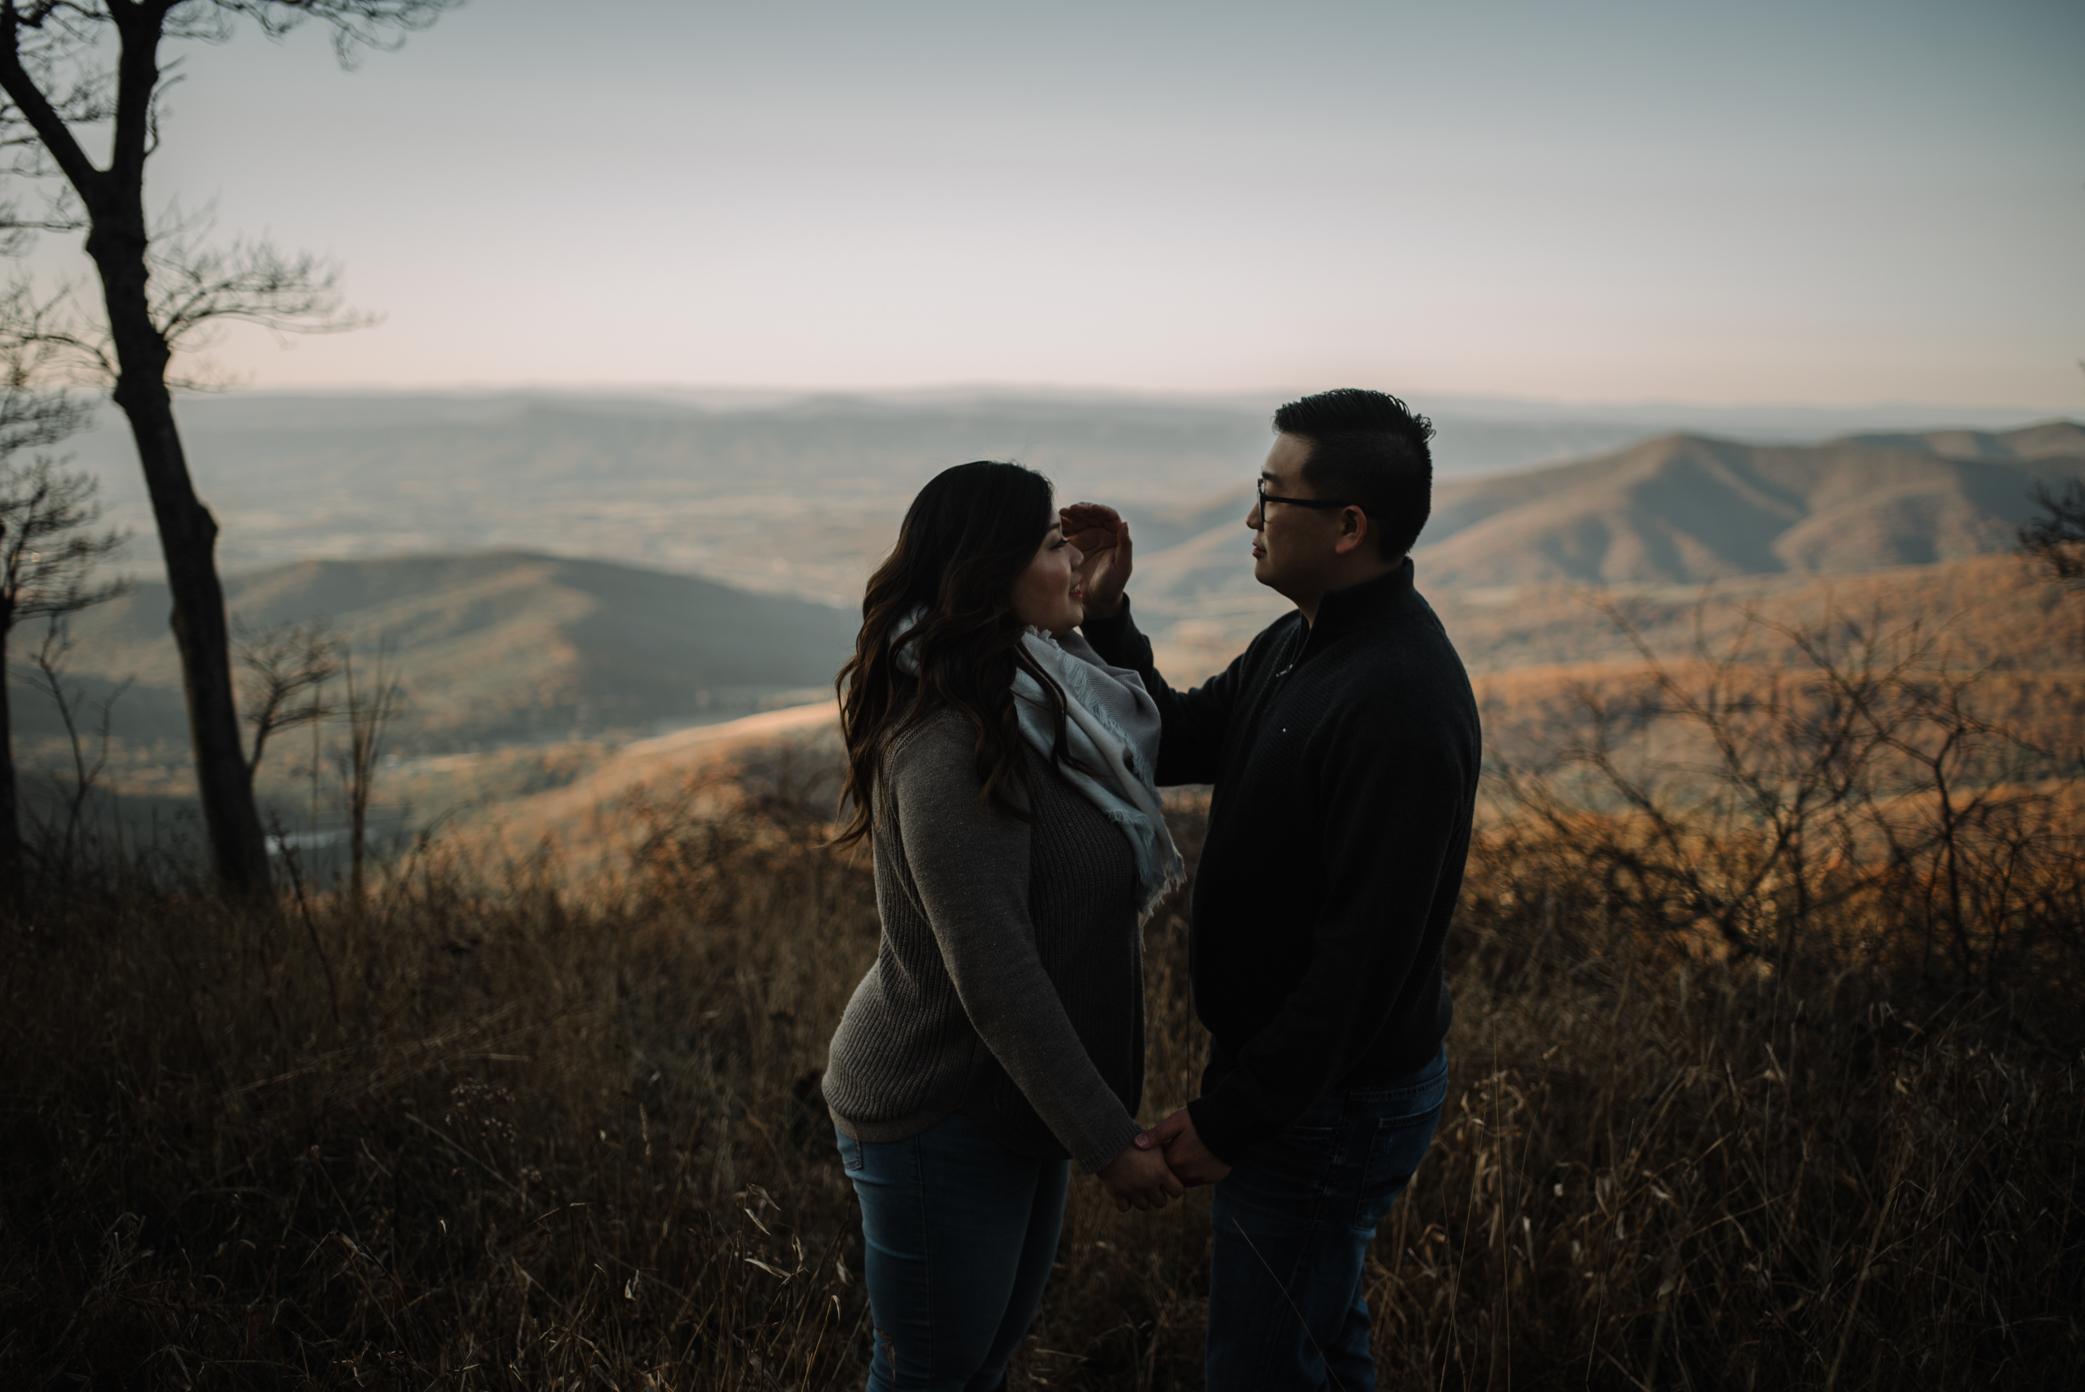 Joshua and Kristina - Shenandoah National Park - Skyline Drive - Winter Engagement Session Photographer - White Sails Creative_22.JPG